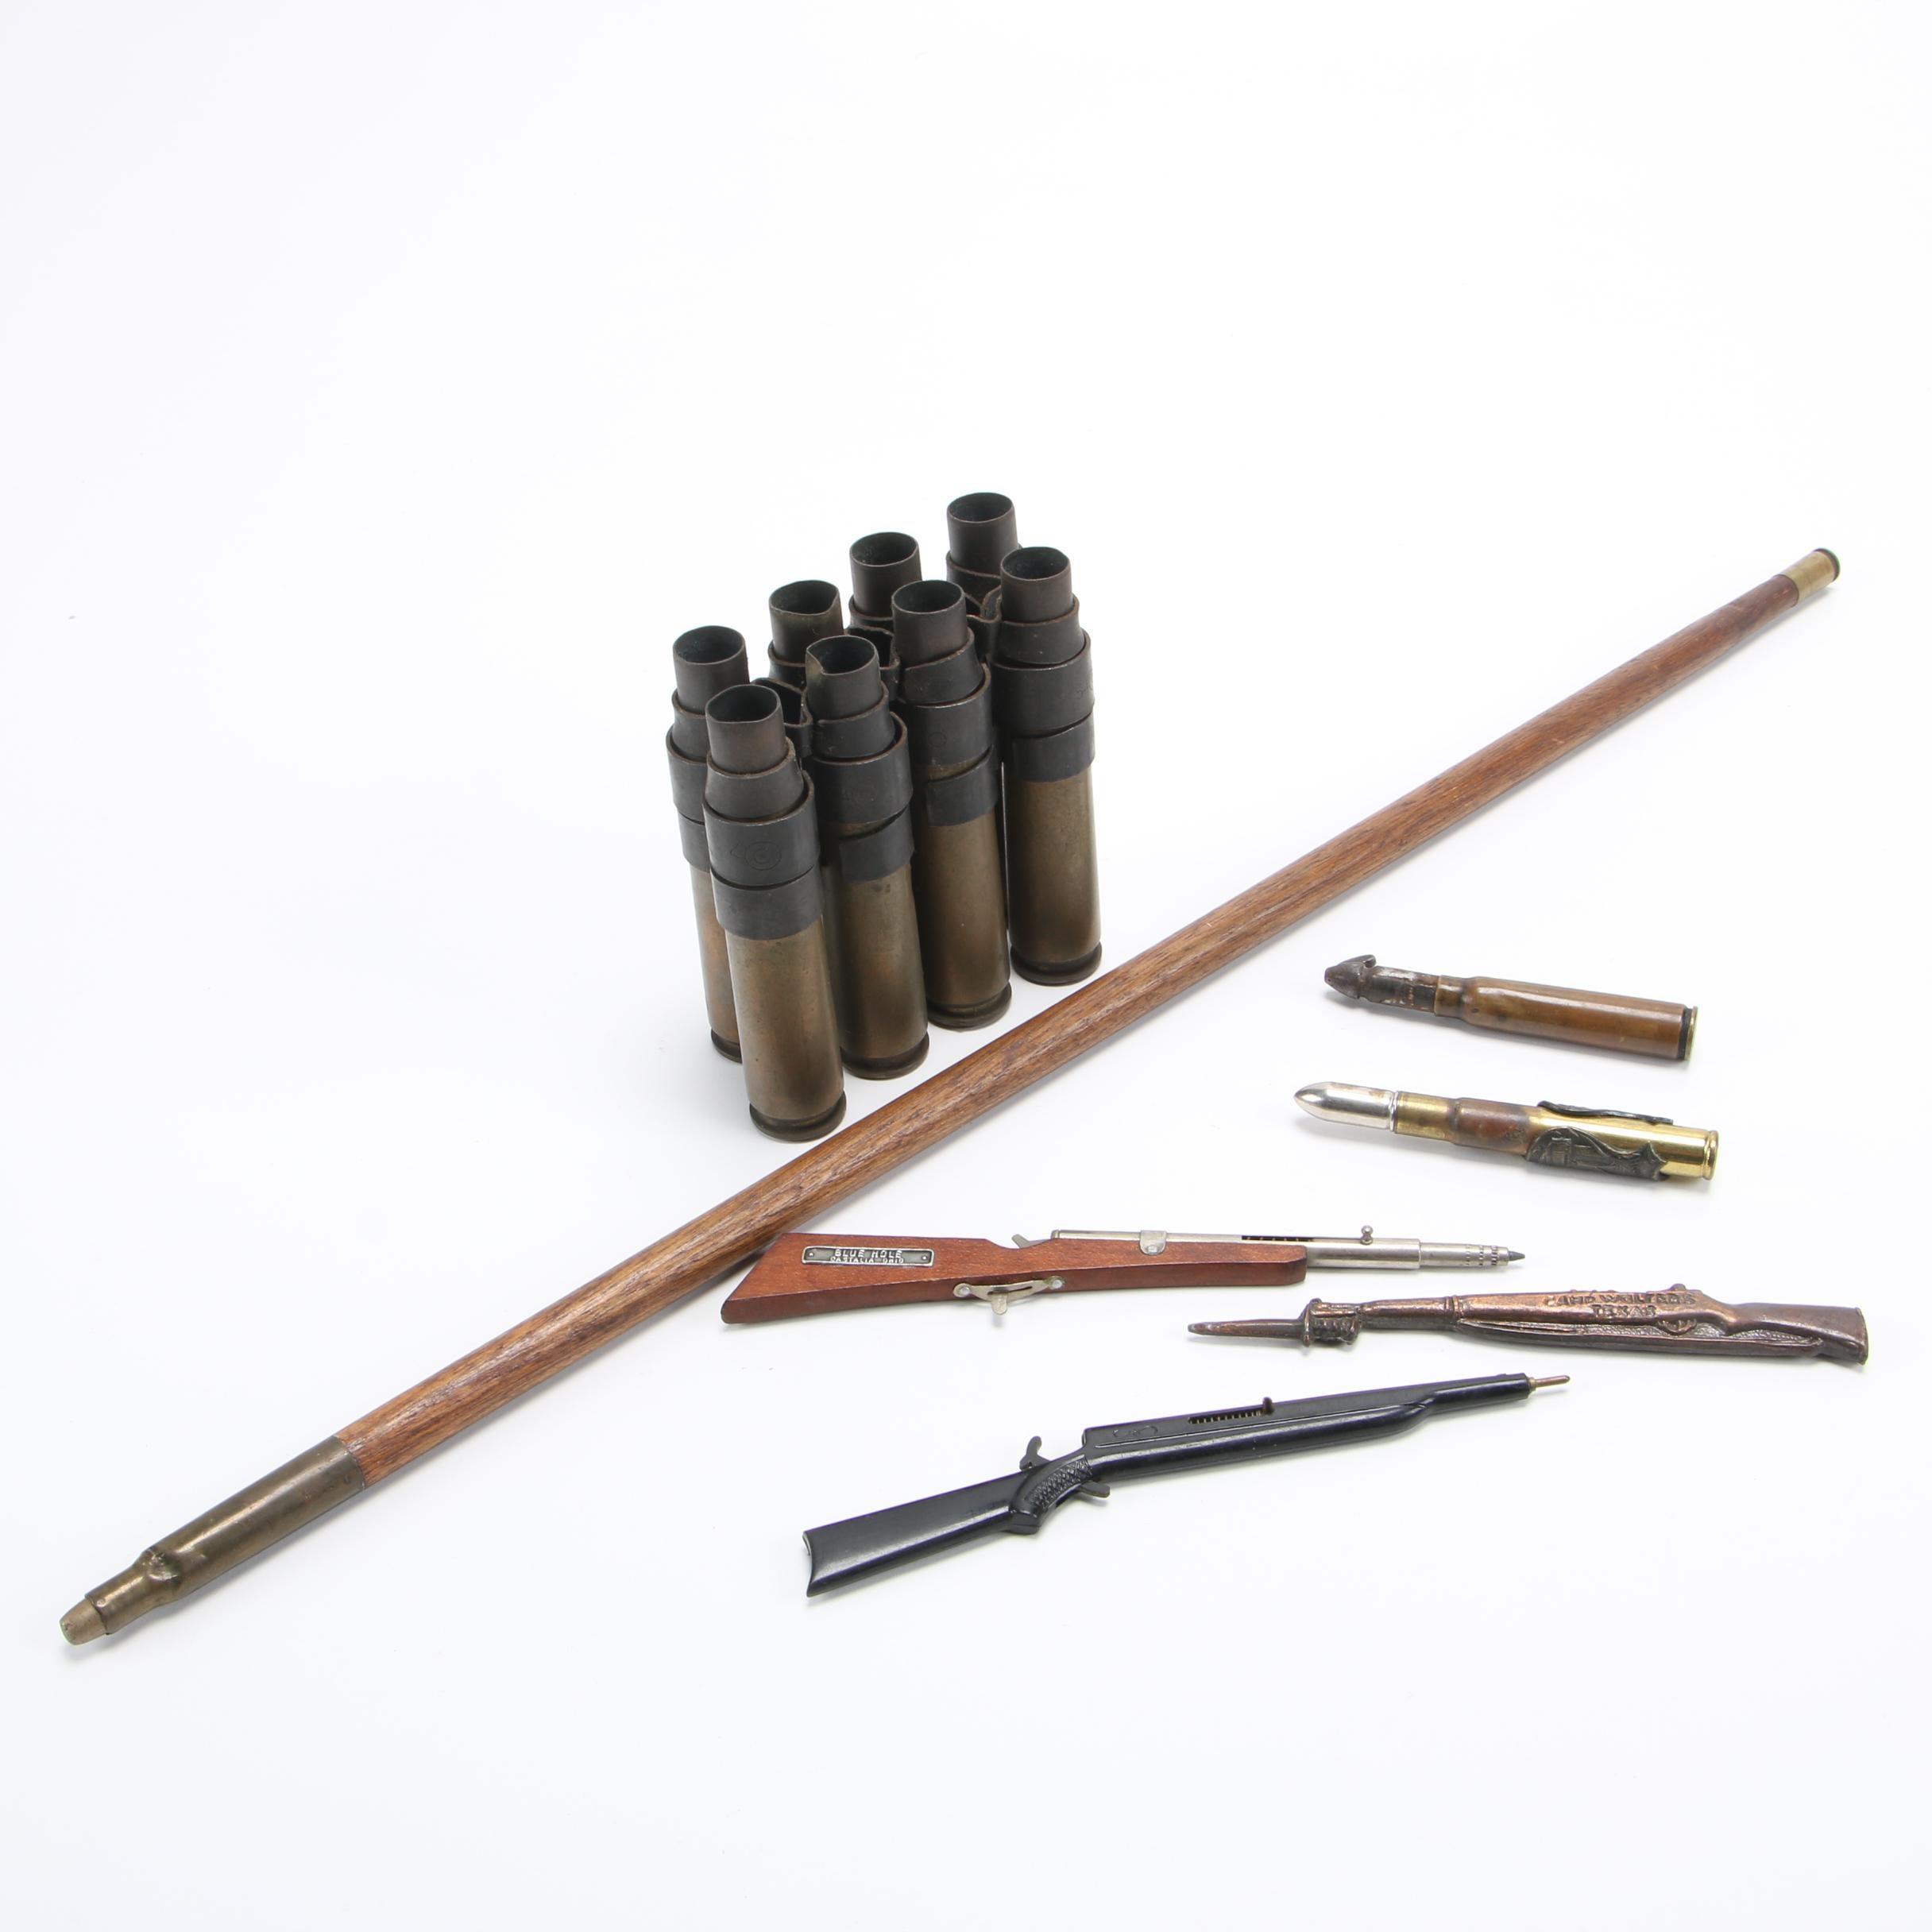 Vintage Souvenir Bullets, Casings, Rifle Shaped Pens, Figurine and Pointer